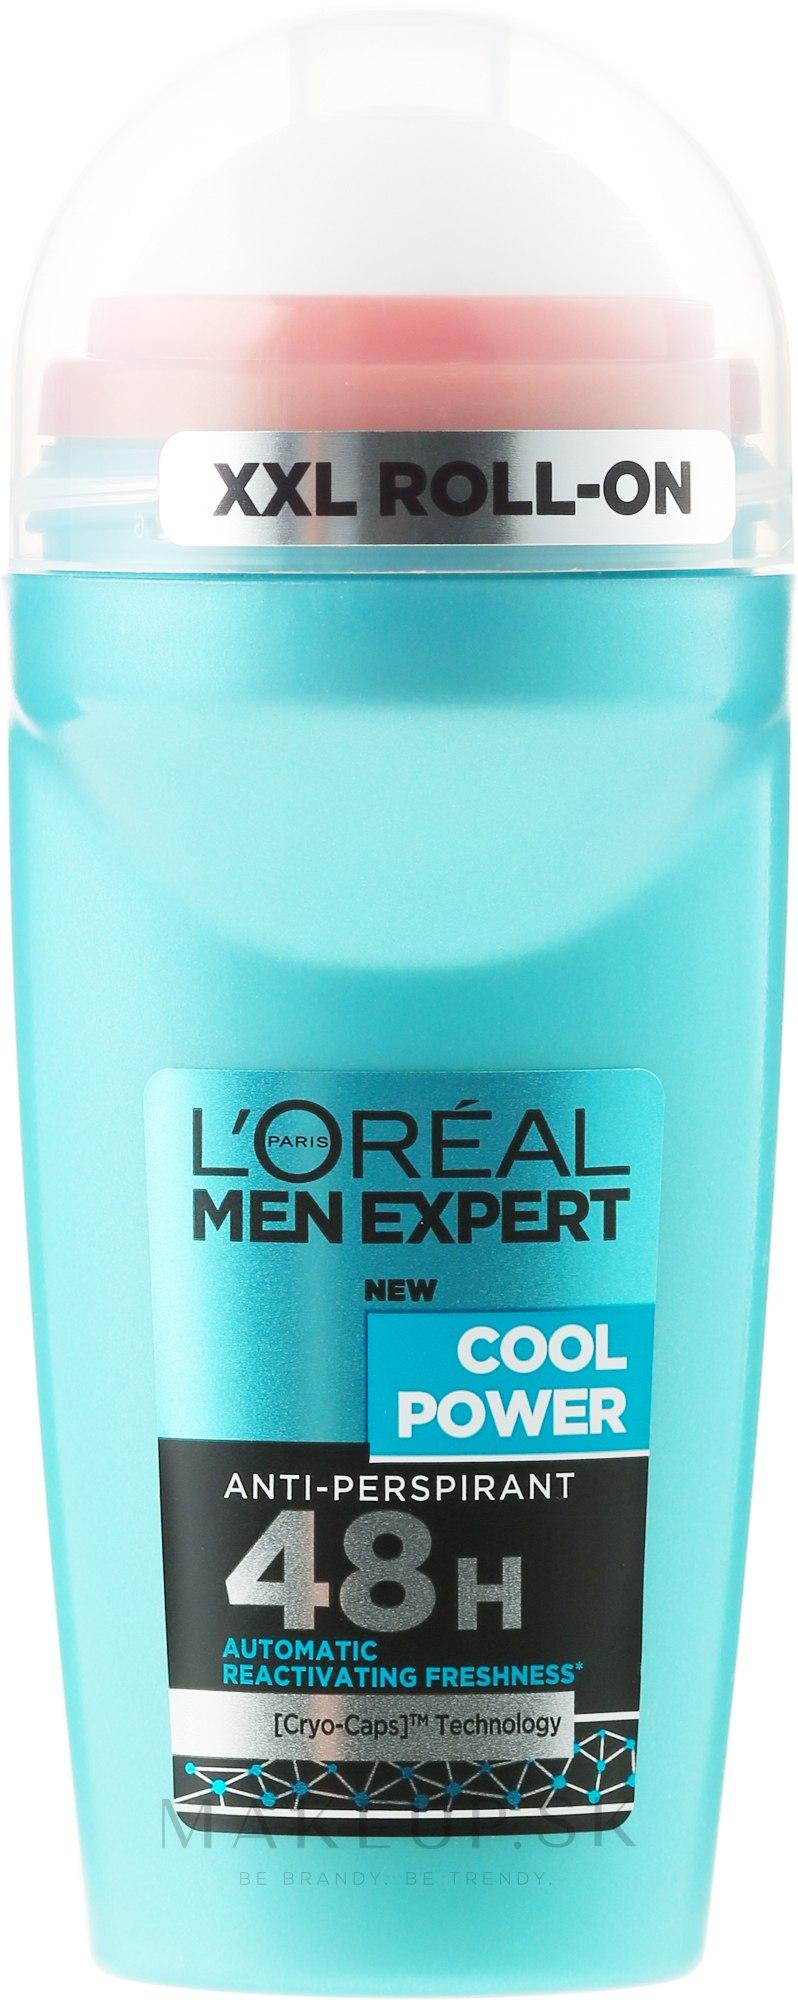 Guľôčkový deodorant - L'Oreal Paris Men Expert Cool Power Deodorant Roll-on — Obrázky 50 ml